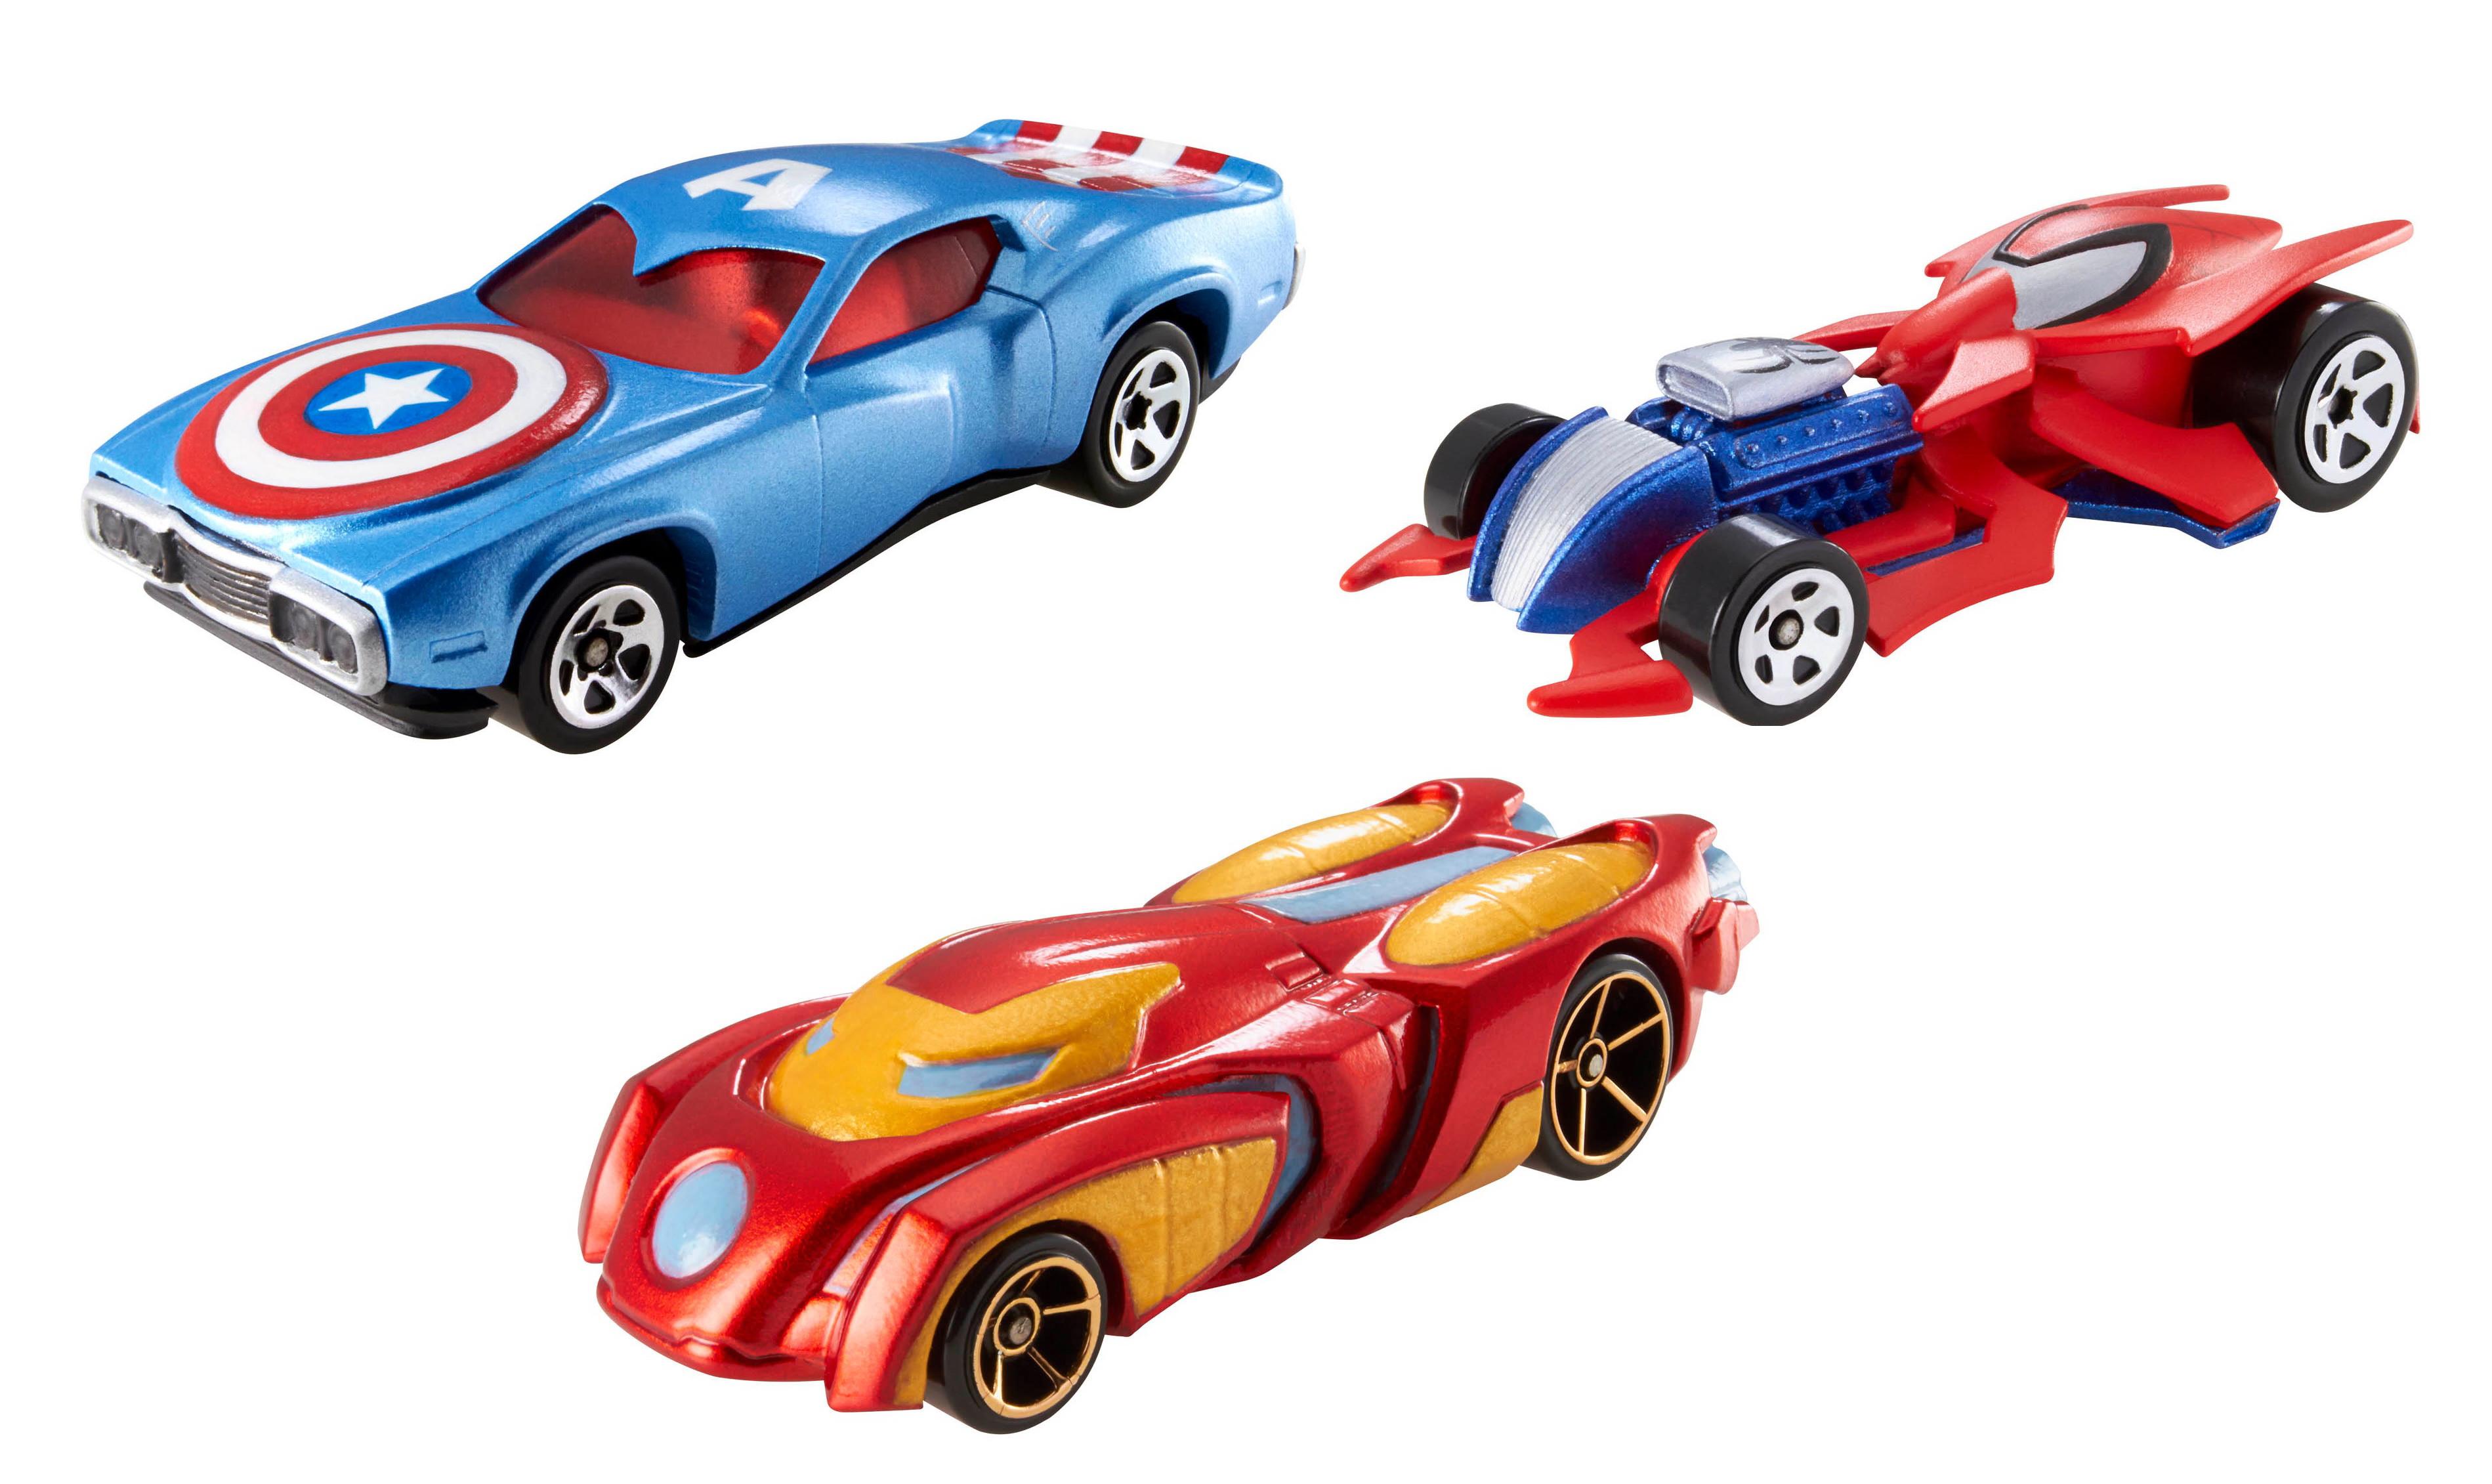 3797x2261 Clip Art Cartoon Hot Wheel Cars Clipart